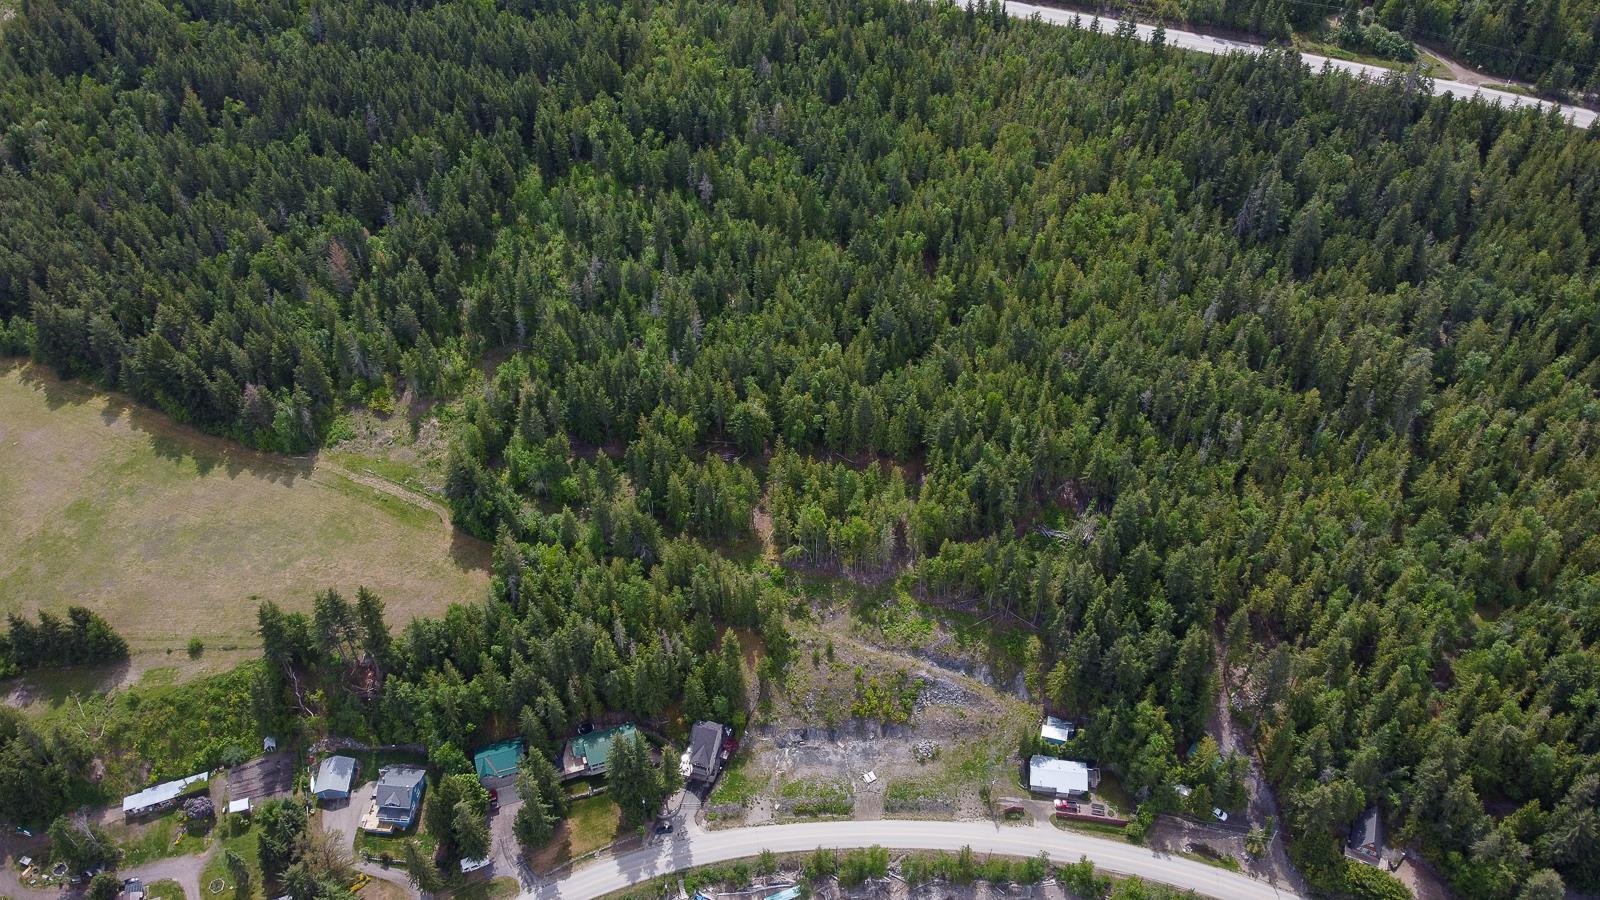 Lot 1-5 Blind Bay Road,, Blind Bay, British Columbia  V0E 1H0 - Photo 21 - 10232466